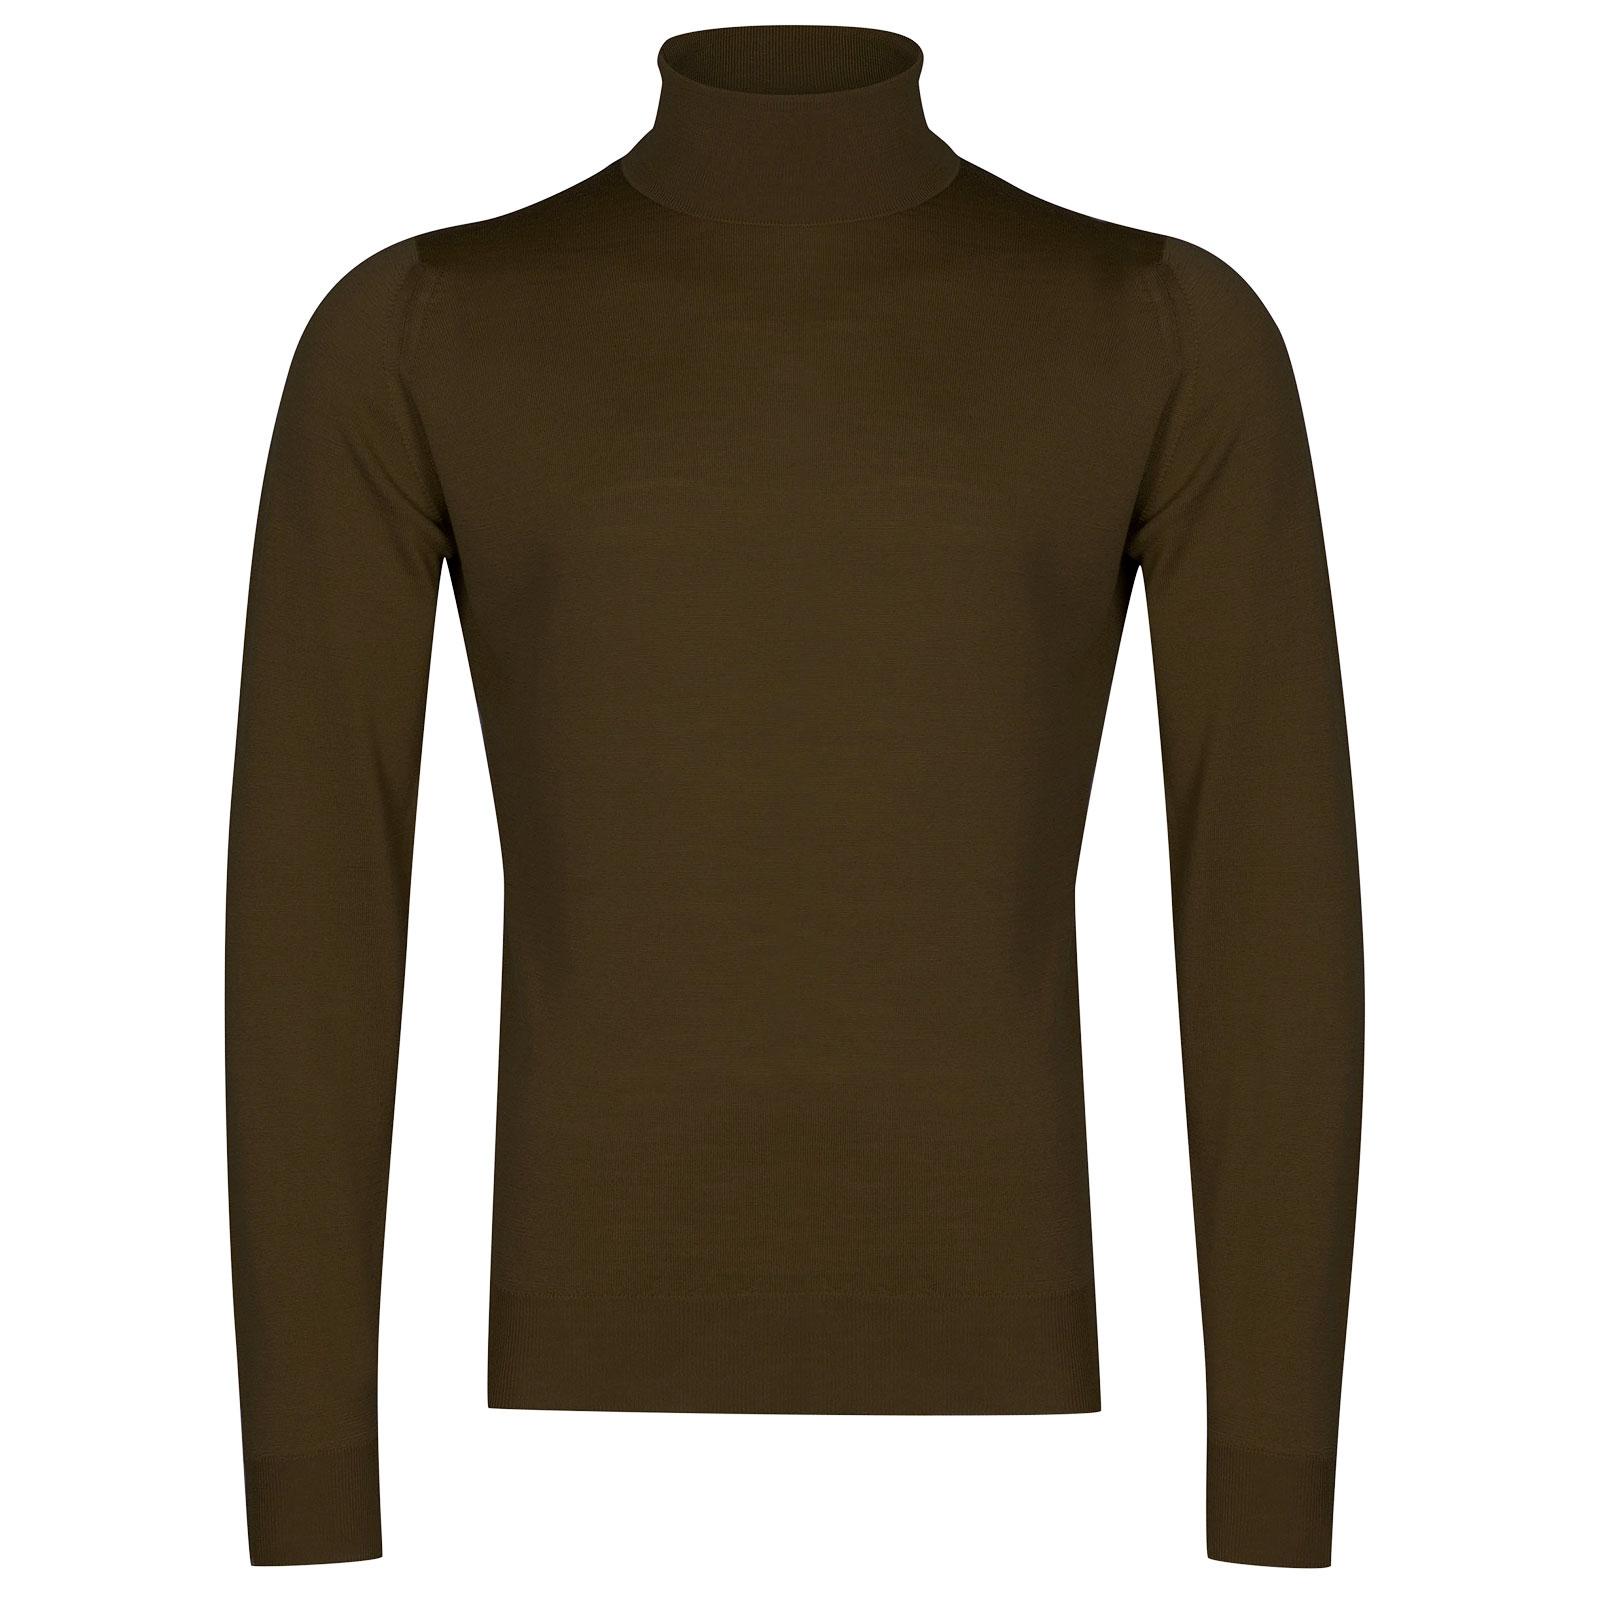 John Smedley Cherwell Merino Wool Pullover in Khaki-XL